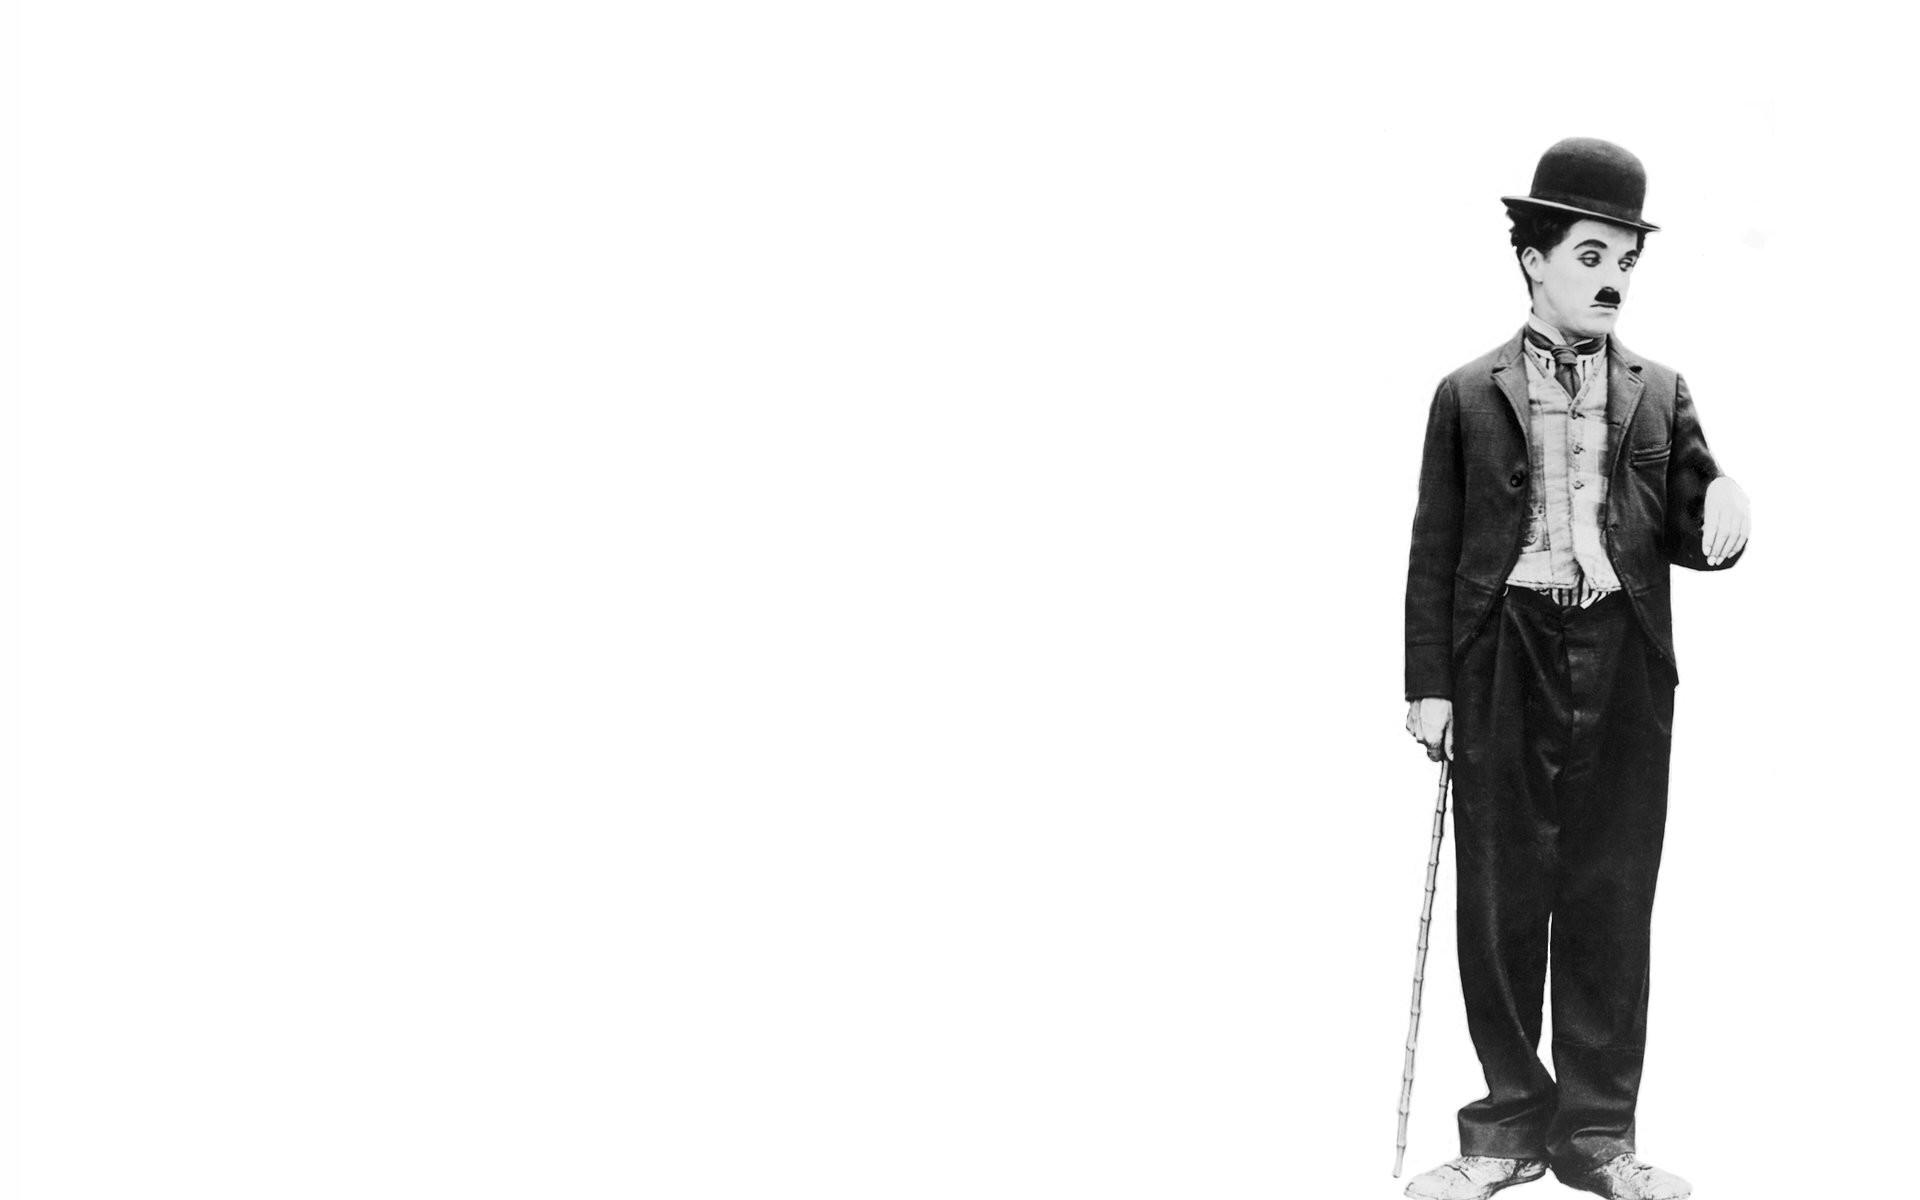 58 Charlie Chaplin Wallpapers on WallpaperPlay 1920x1200